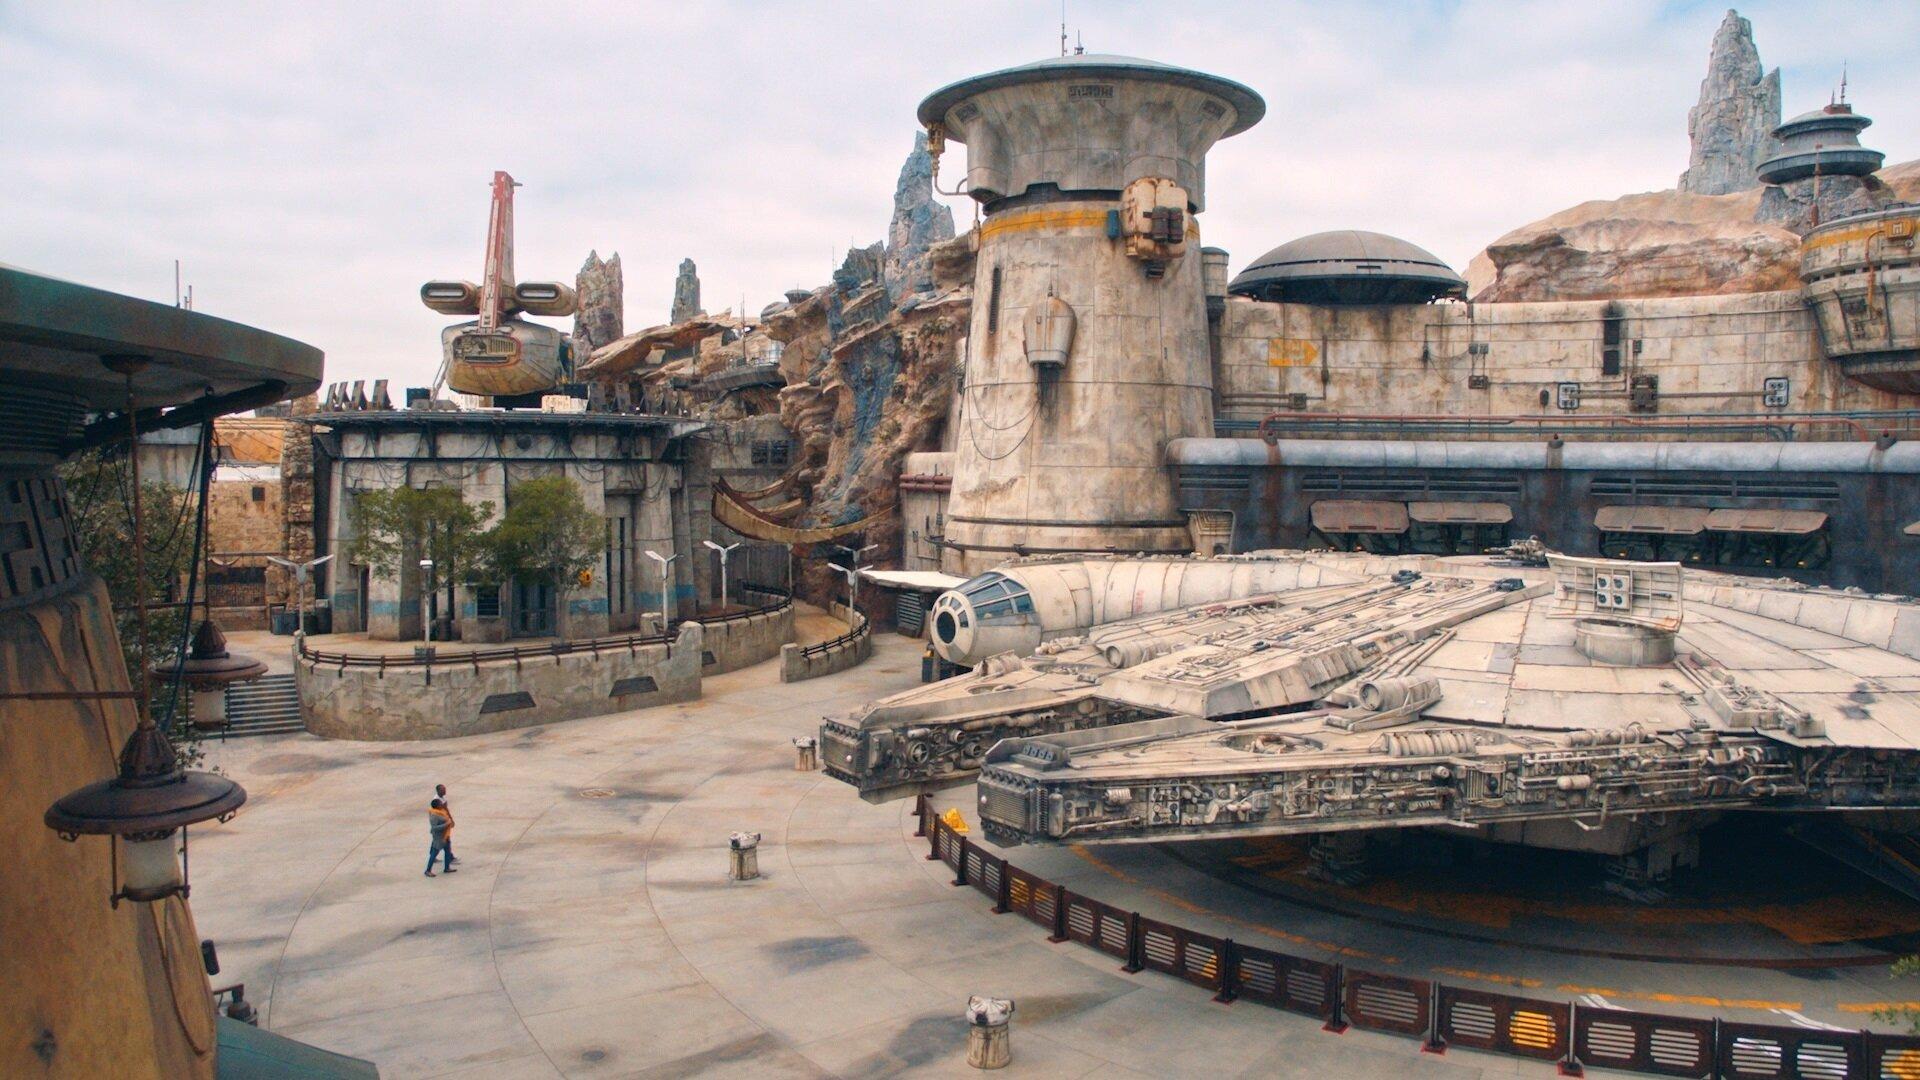 02 - Star Wars: Galaxy's Edge